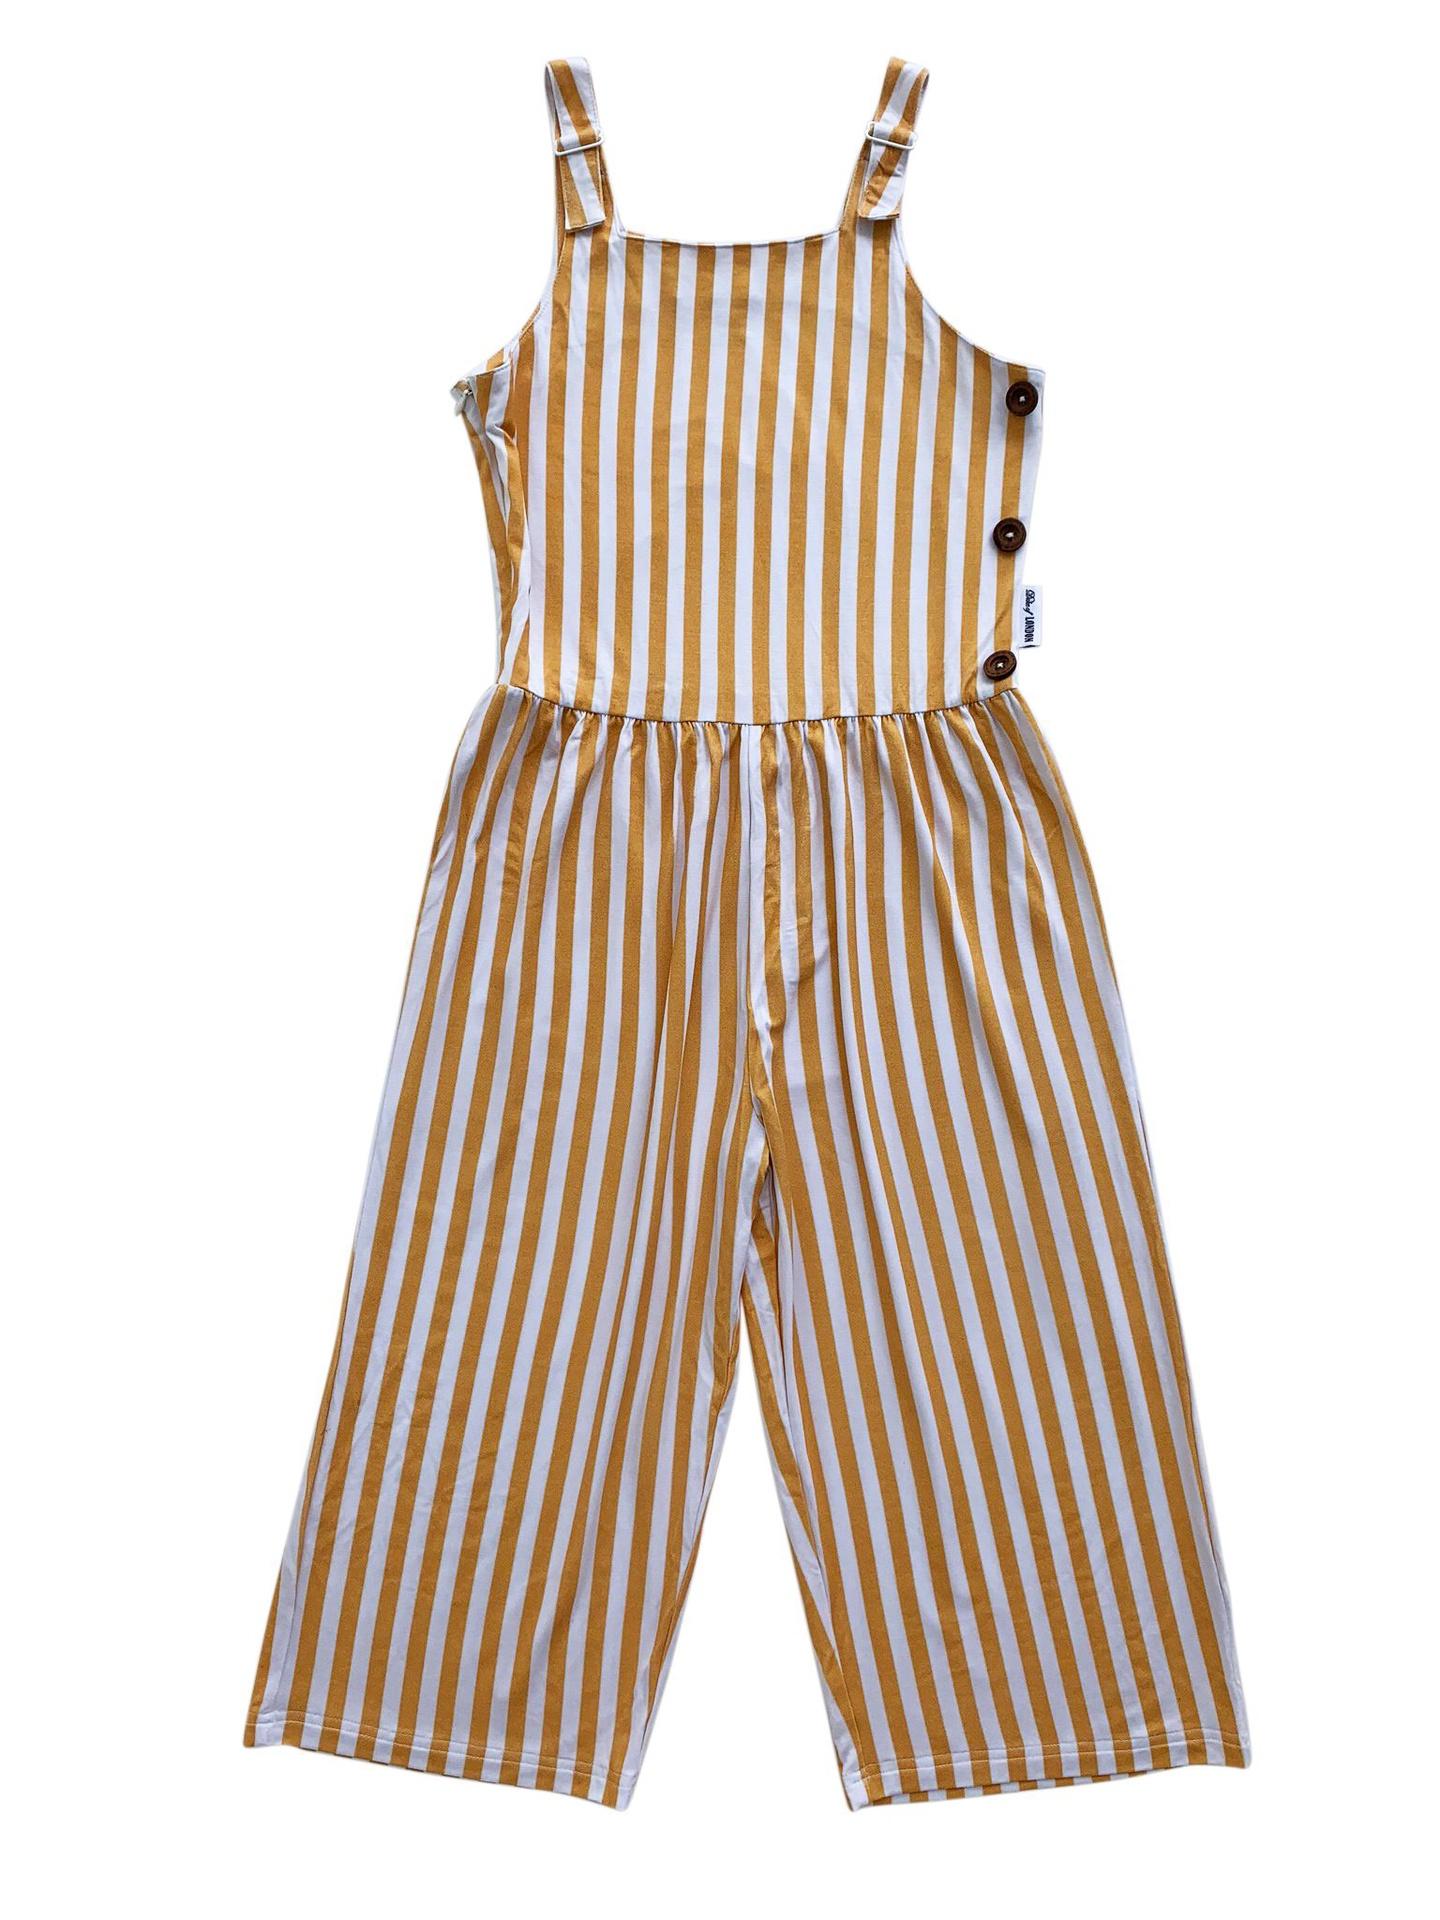 Duke of London Jamaican Jumpsuit (lemon stripe)